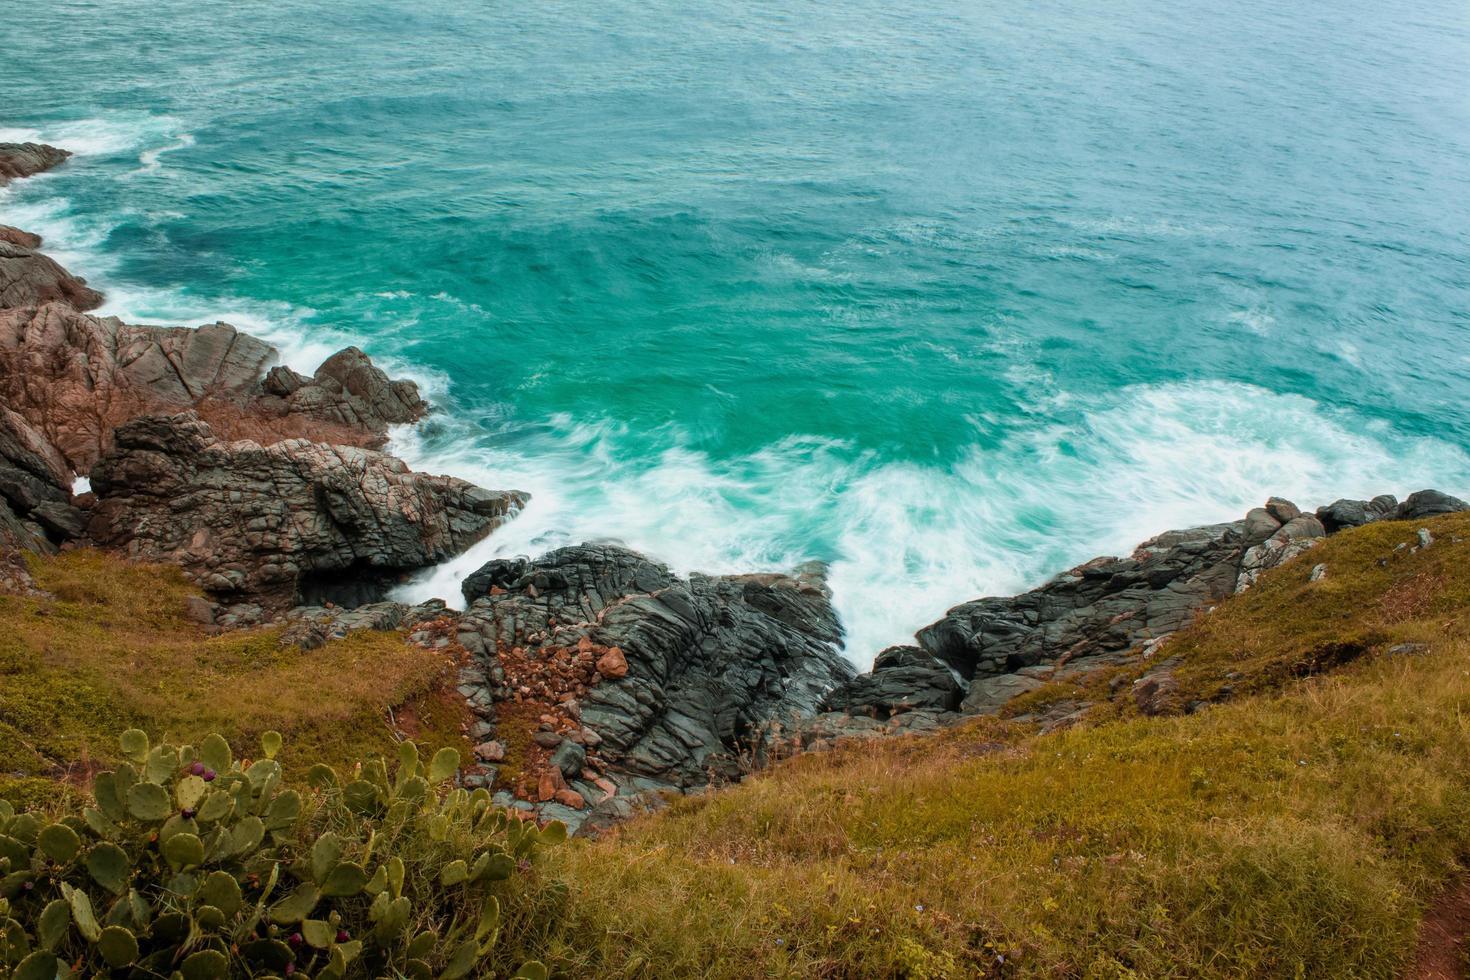 grasbewachsene Klippe nahe Ozean foto